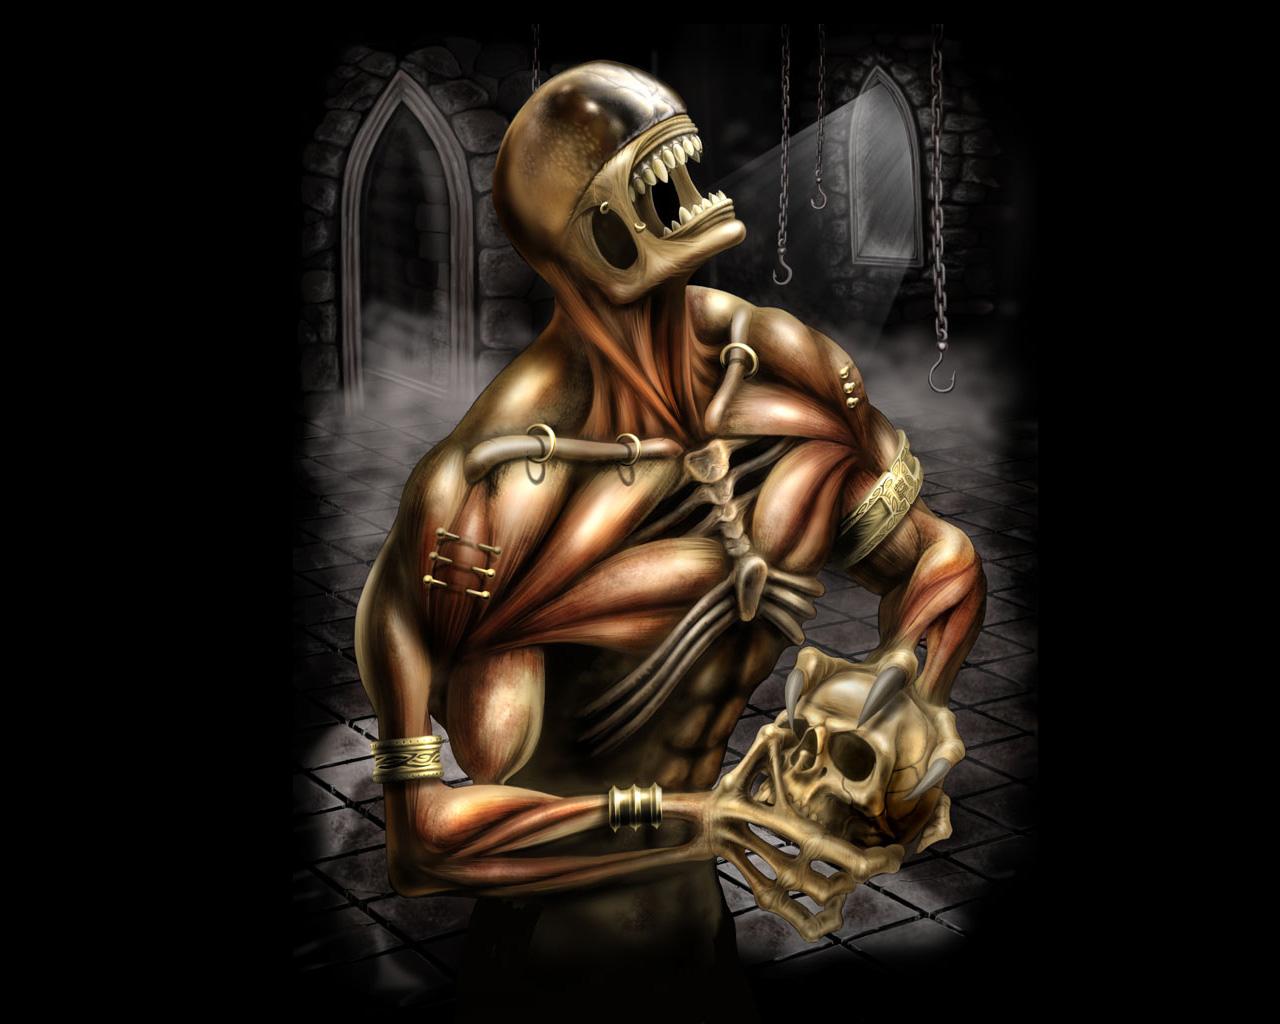 http://2.bp.blogspot.com/-JPmH3fqvFEQ/TqPPO3txt9I/AAAAAAAACn0/tUz-FN6KO4I/s1600/Skull+_wallpapers_+Muscles_holding_Skull.jpg